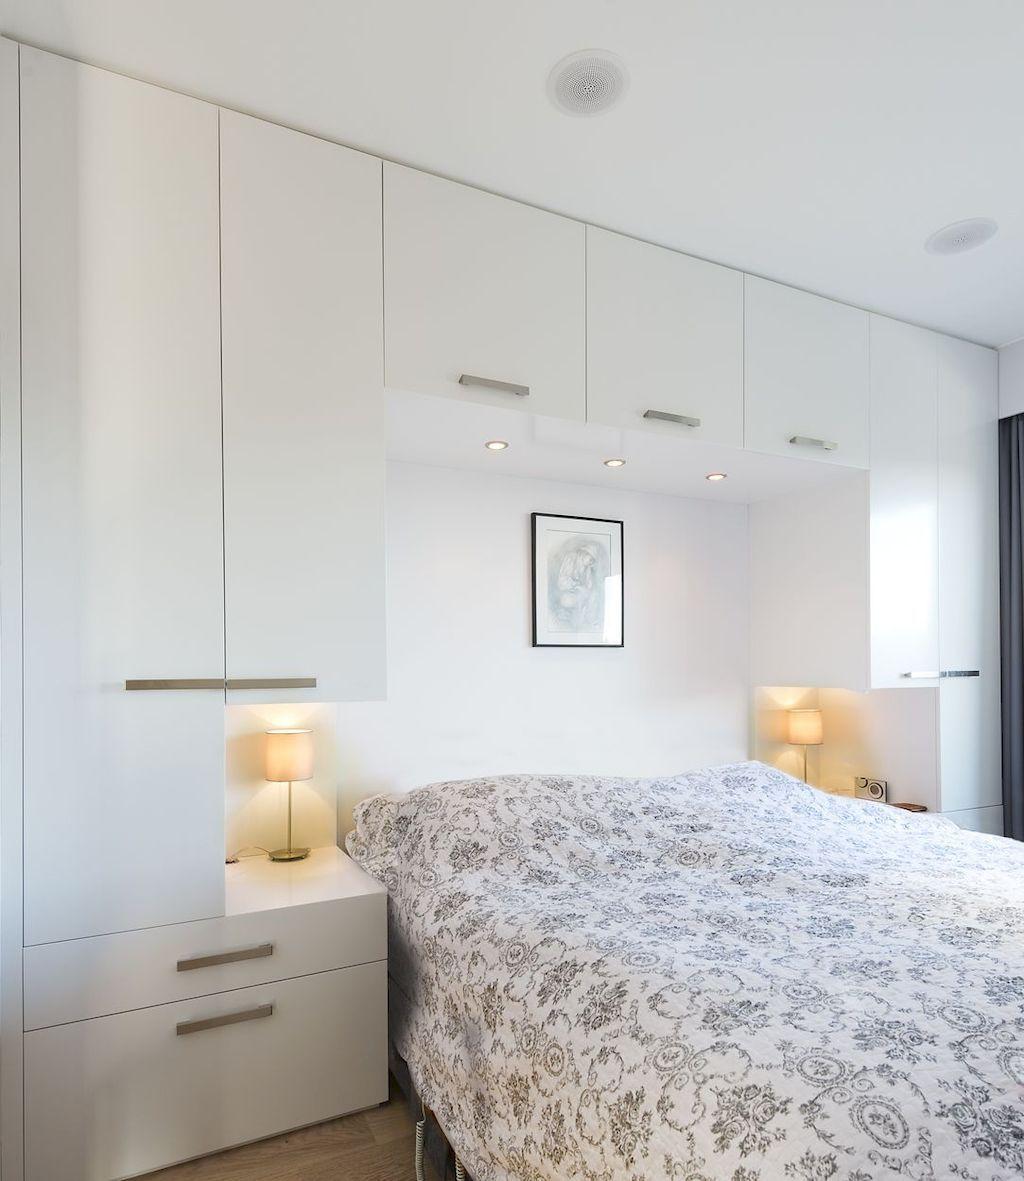 Smart Ideas For Amazing Bedroom Storage Home To Z Bedroom Built Ins Small Master Bedroom Bedroom Interior